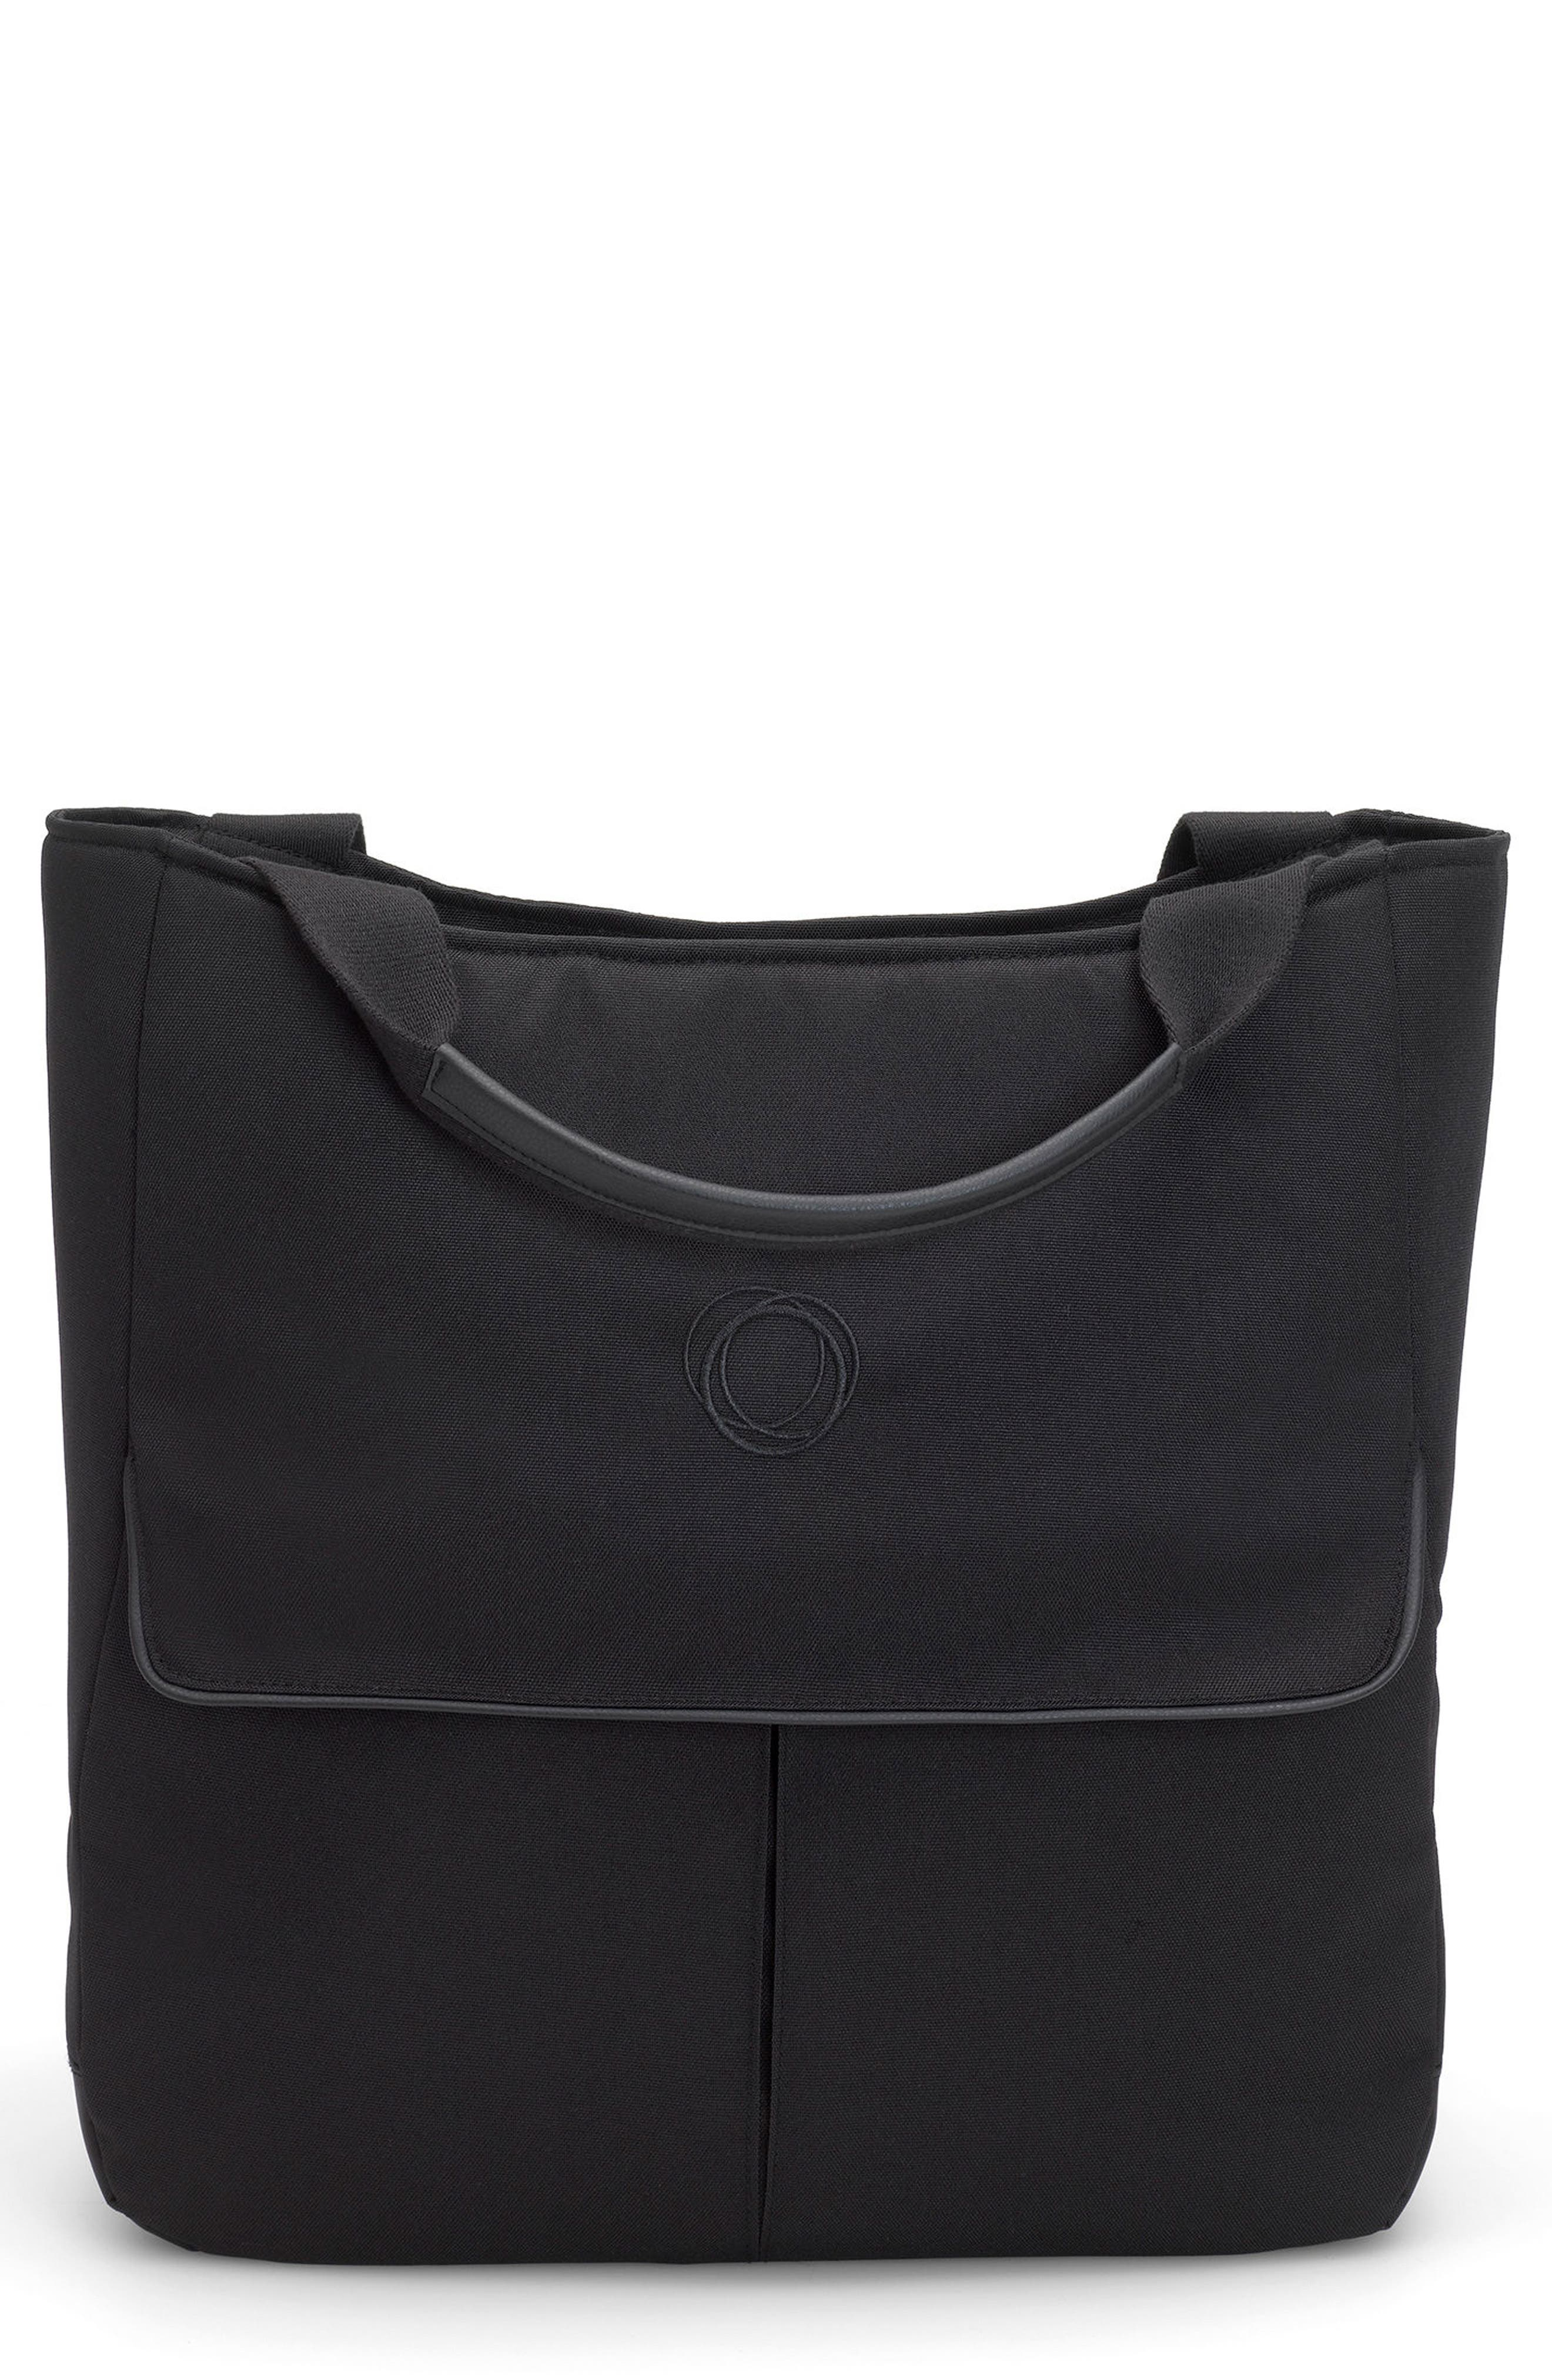 Mammoth Bee Stroller Organizer Bag,                         Main,                         color, BLACK